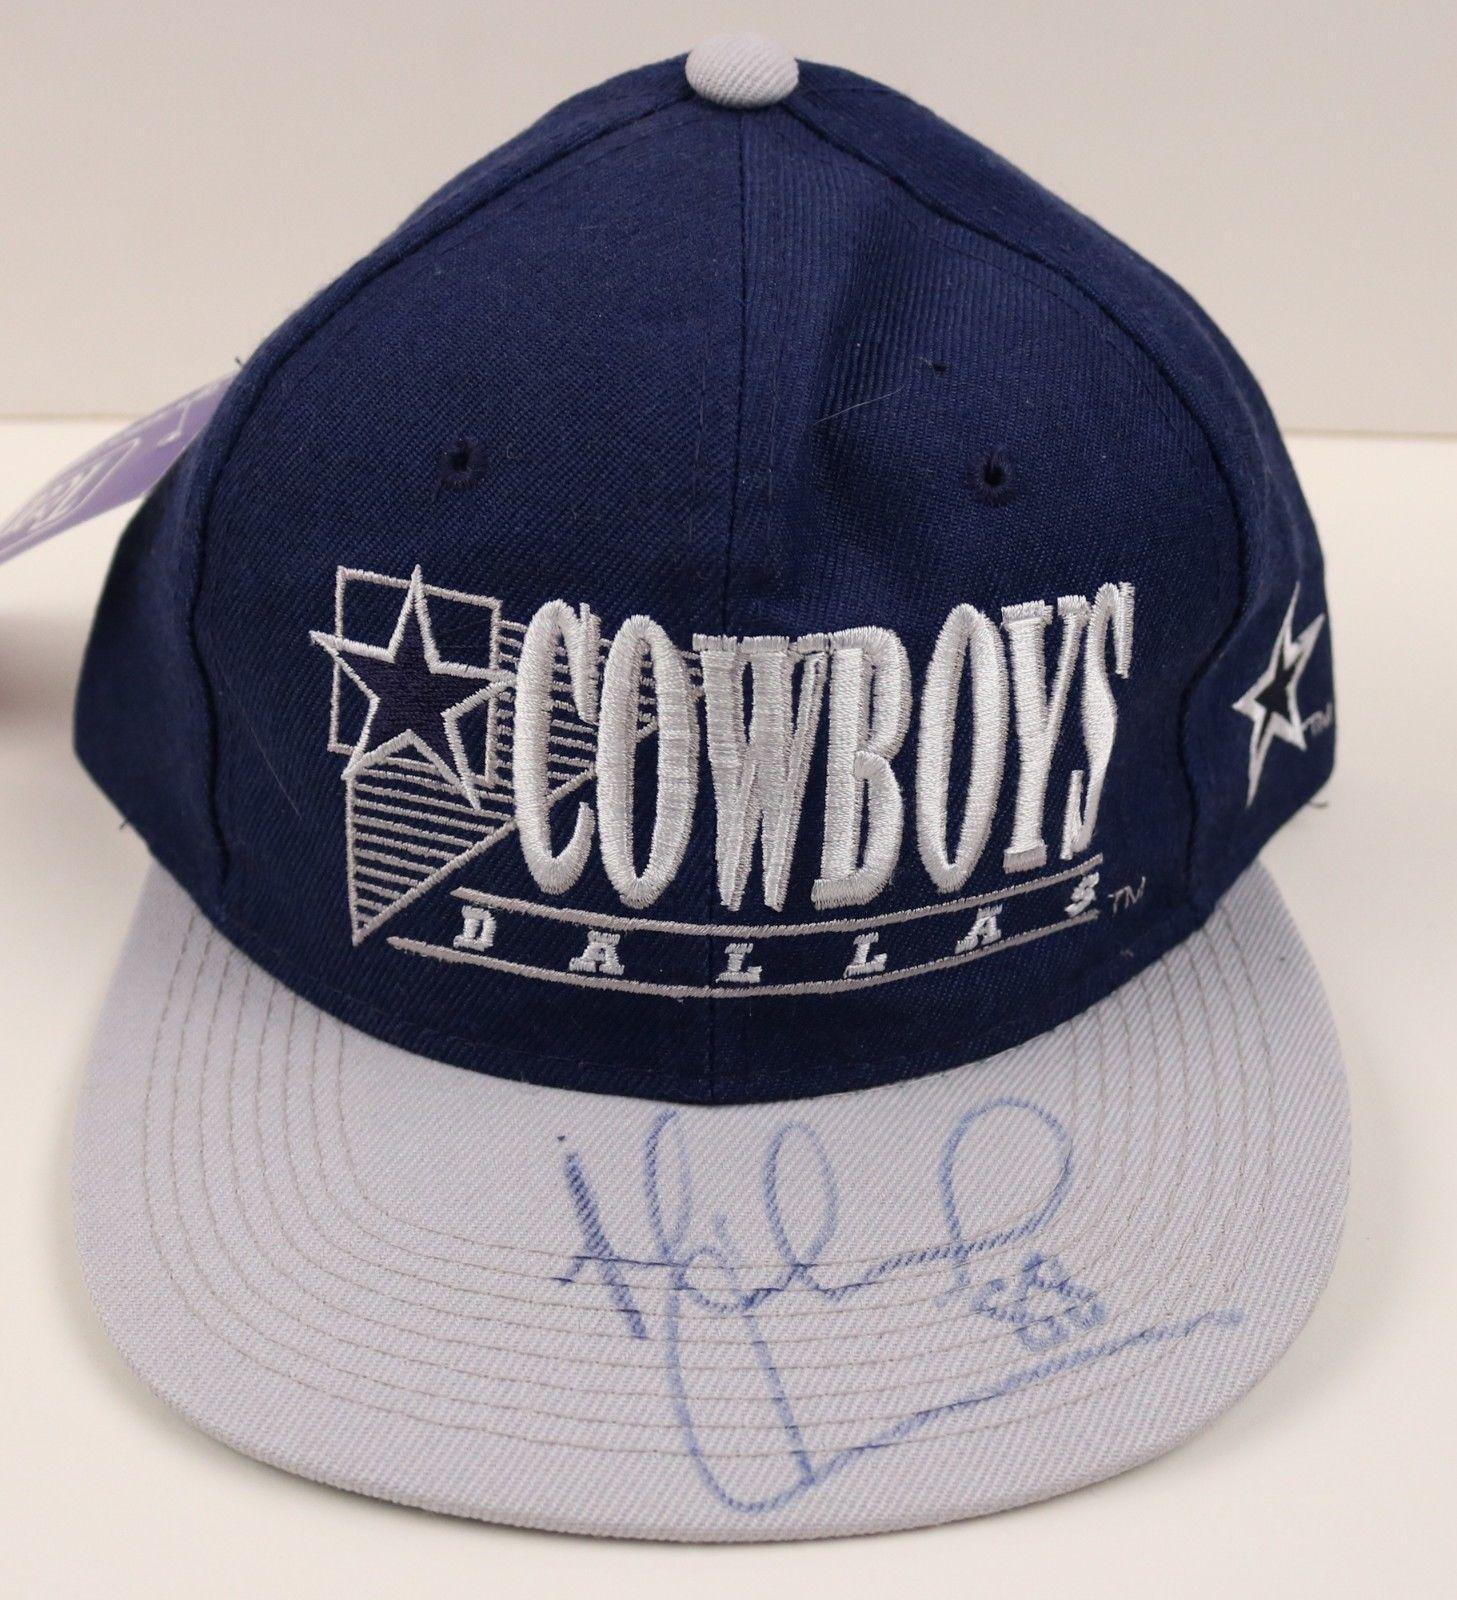 Michael Irvin Cowboys HOF Signed Team NFL Hat COA JSA Certified Autographed NFL Hats